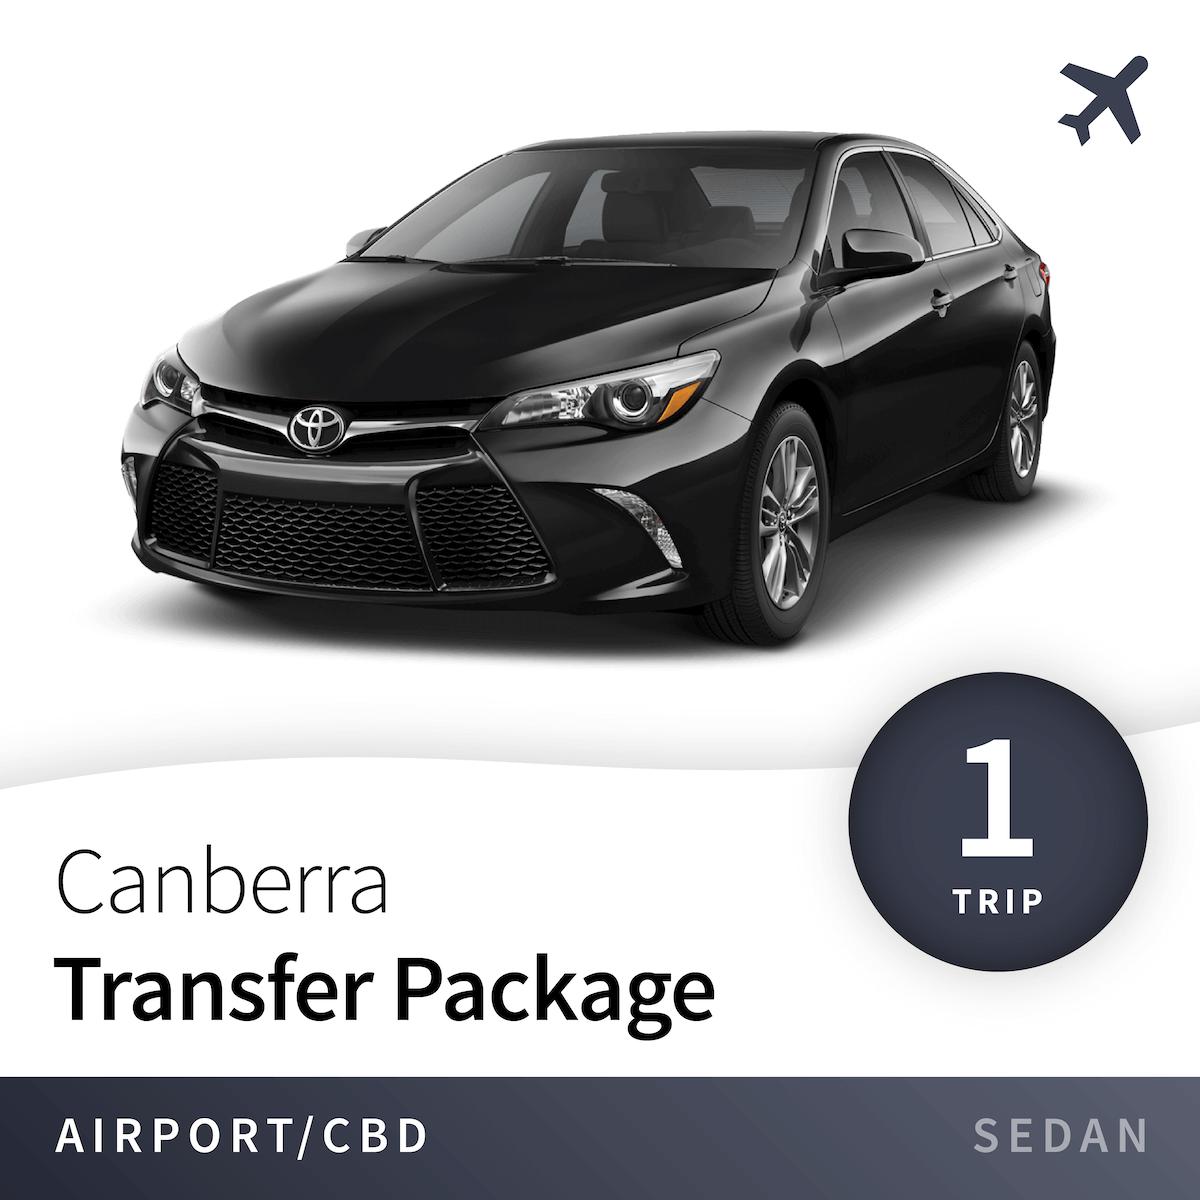 Canberra Airport Transfer Package - Sedan (1 Trip) 1